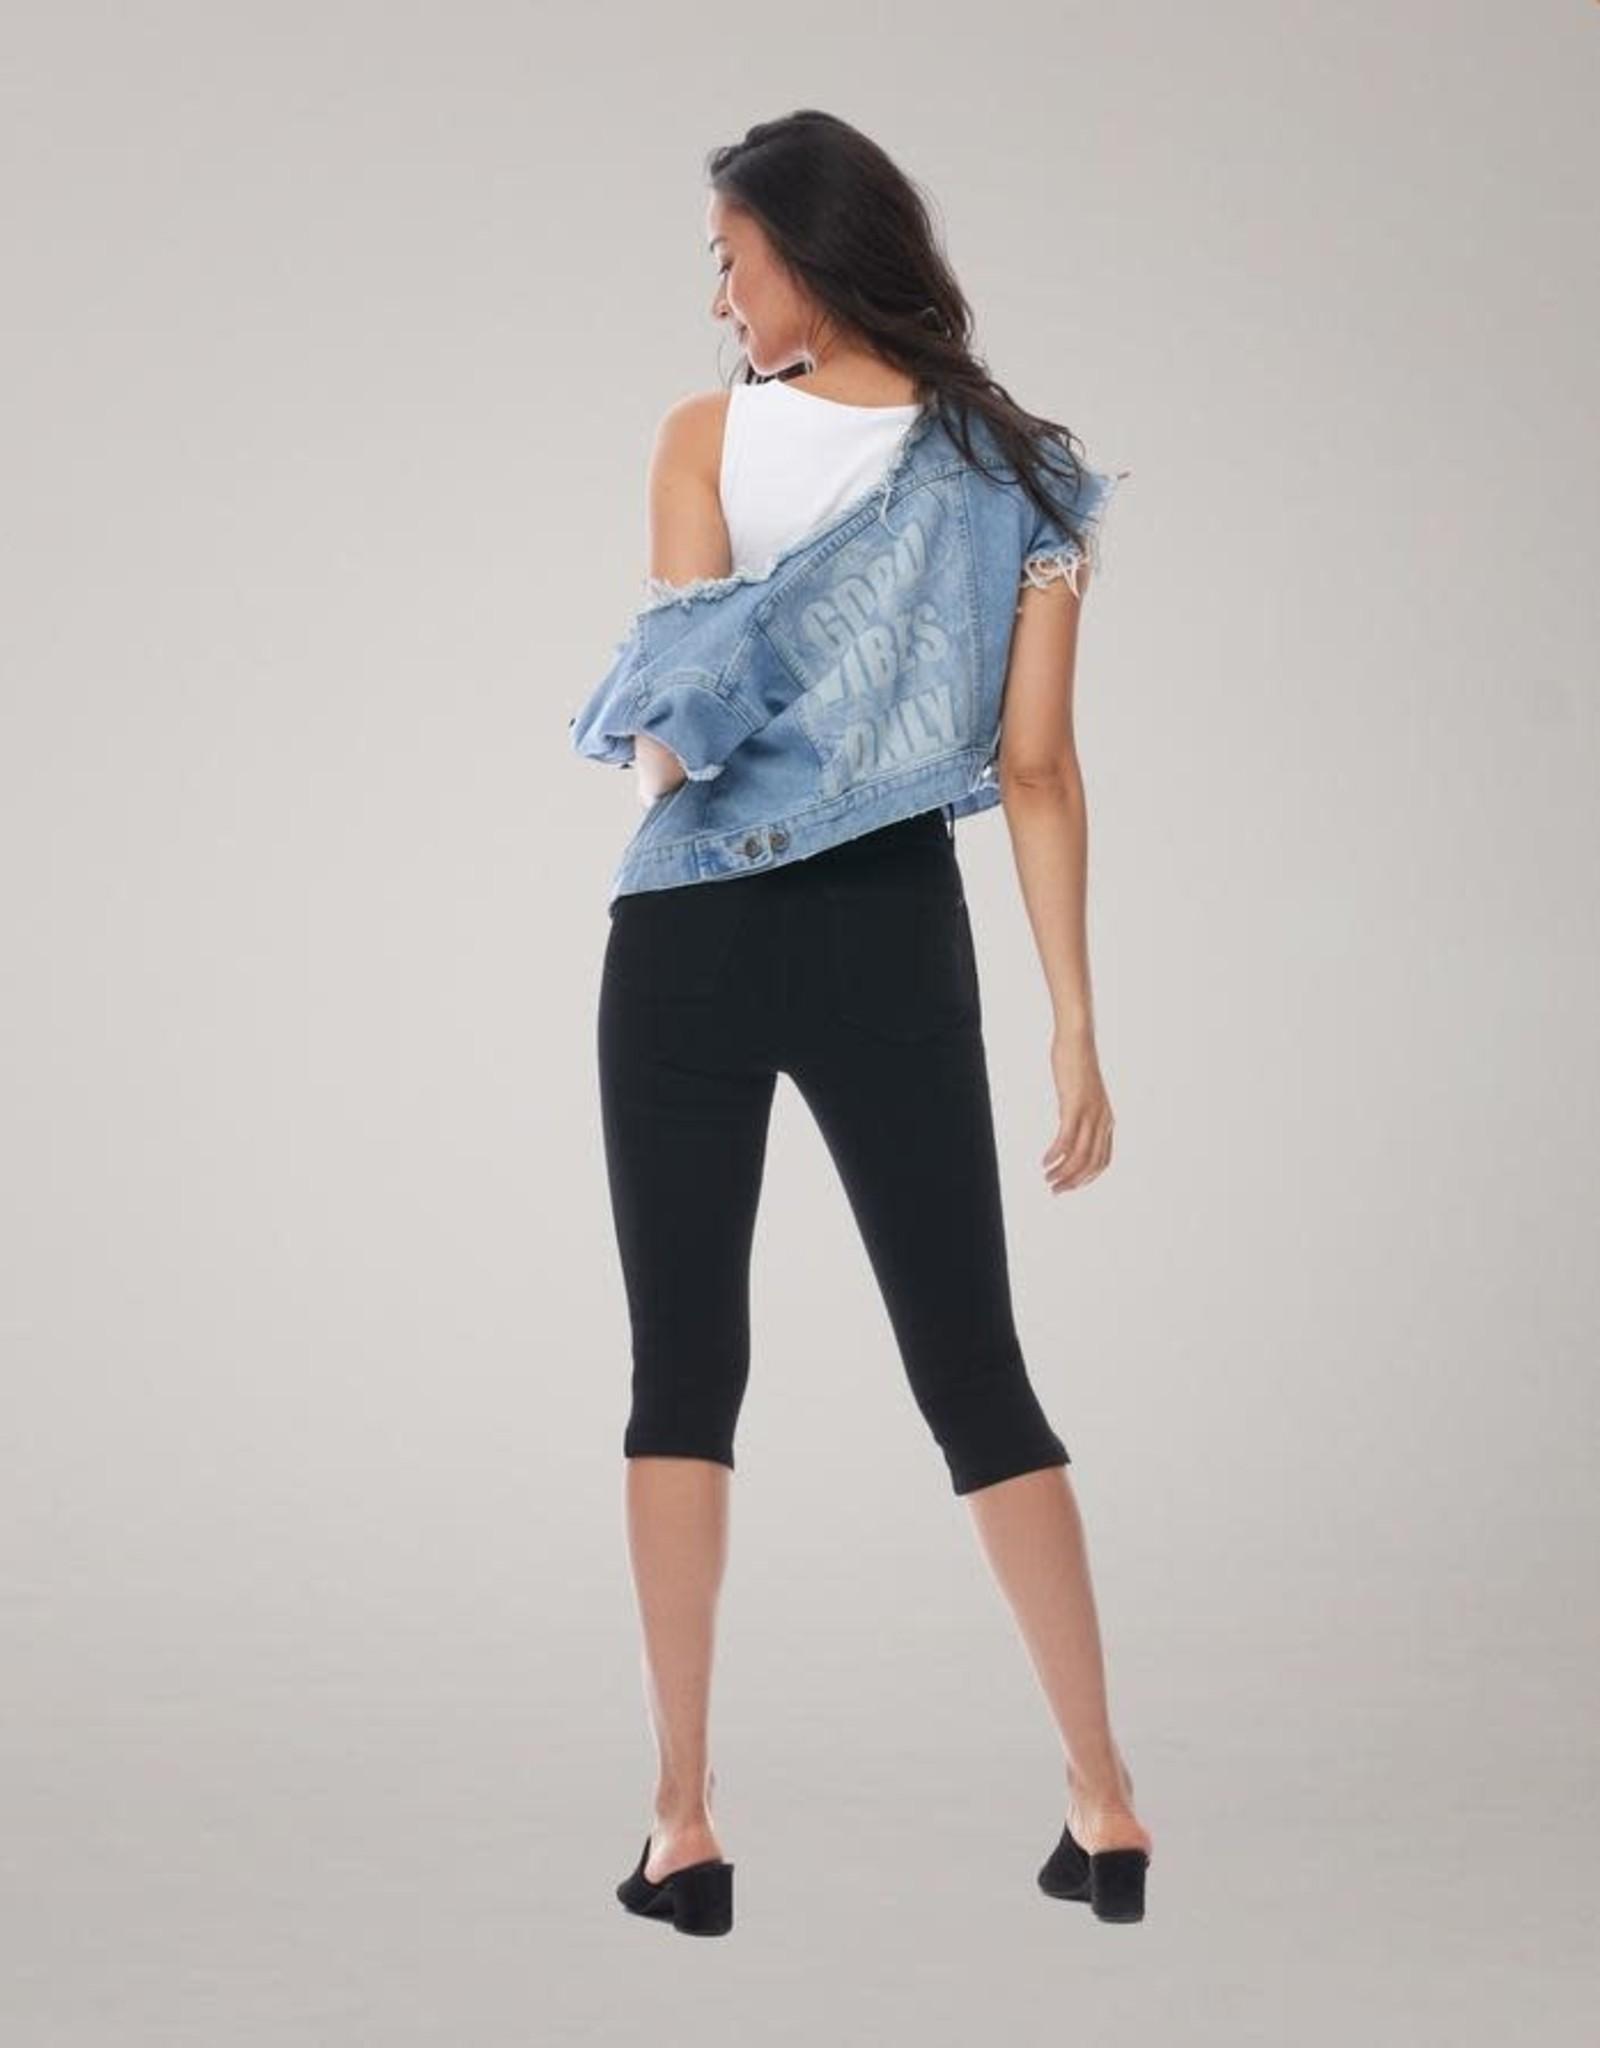 Yoga Jeans Capri High Rise Skinny Rachel 2020 PE20 Yoga Jeans